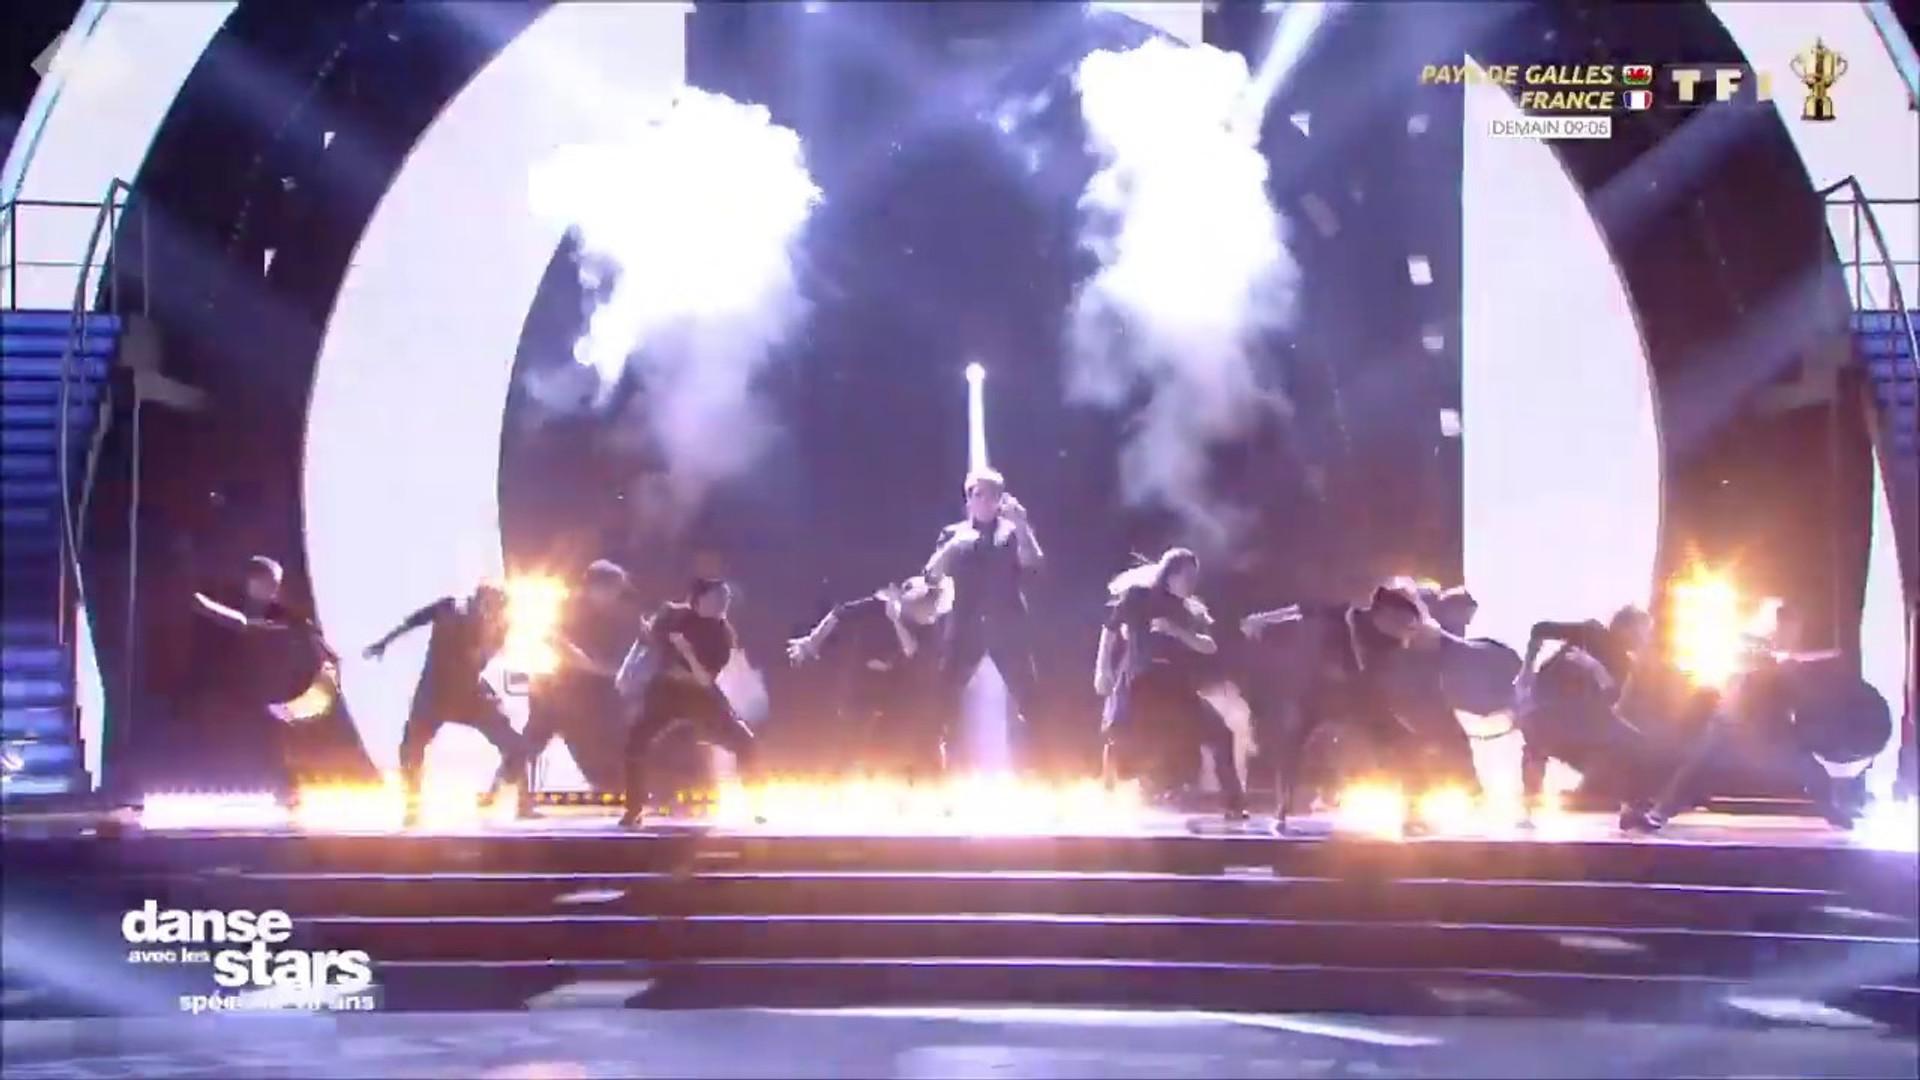 RB Dance Company - DANSE AVEC LES STARS